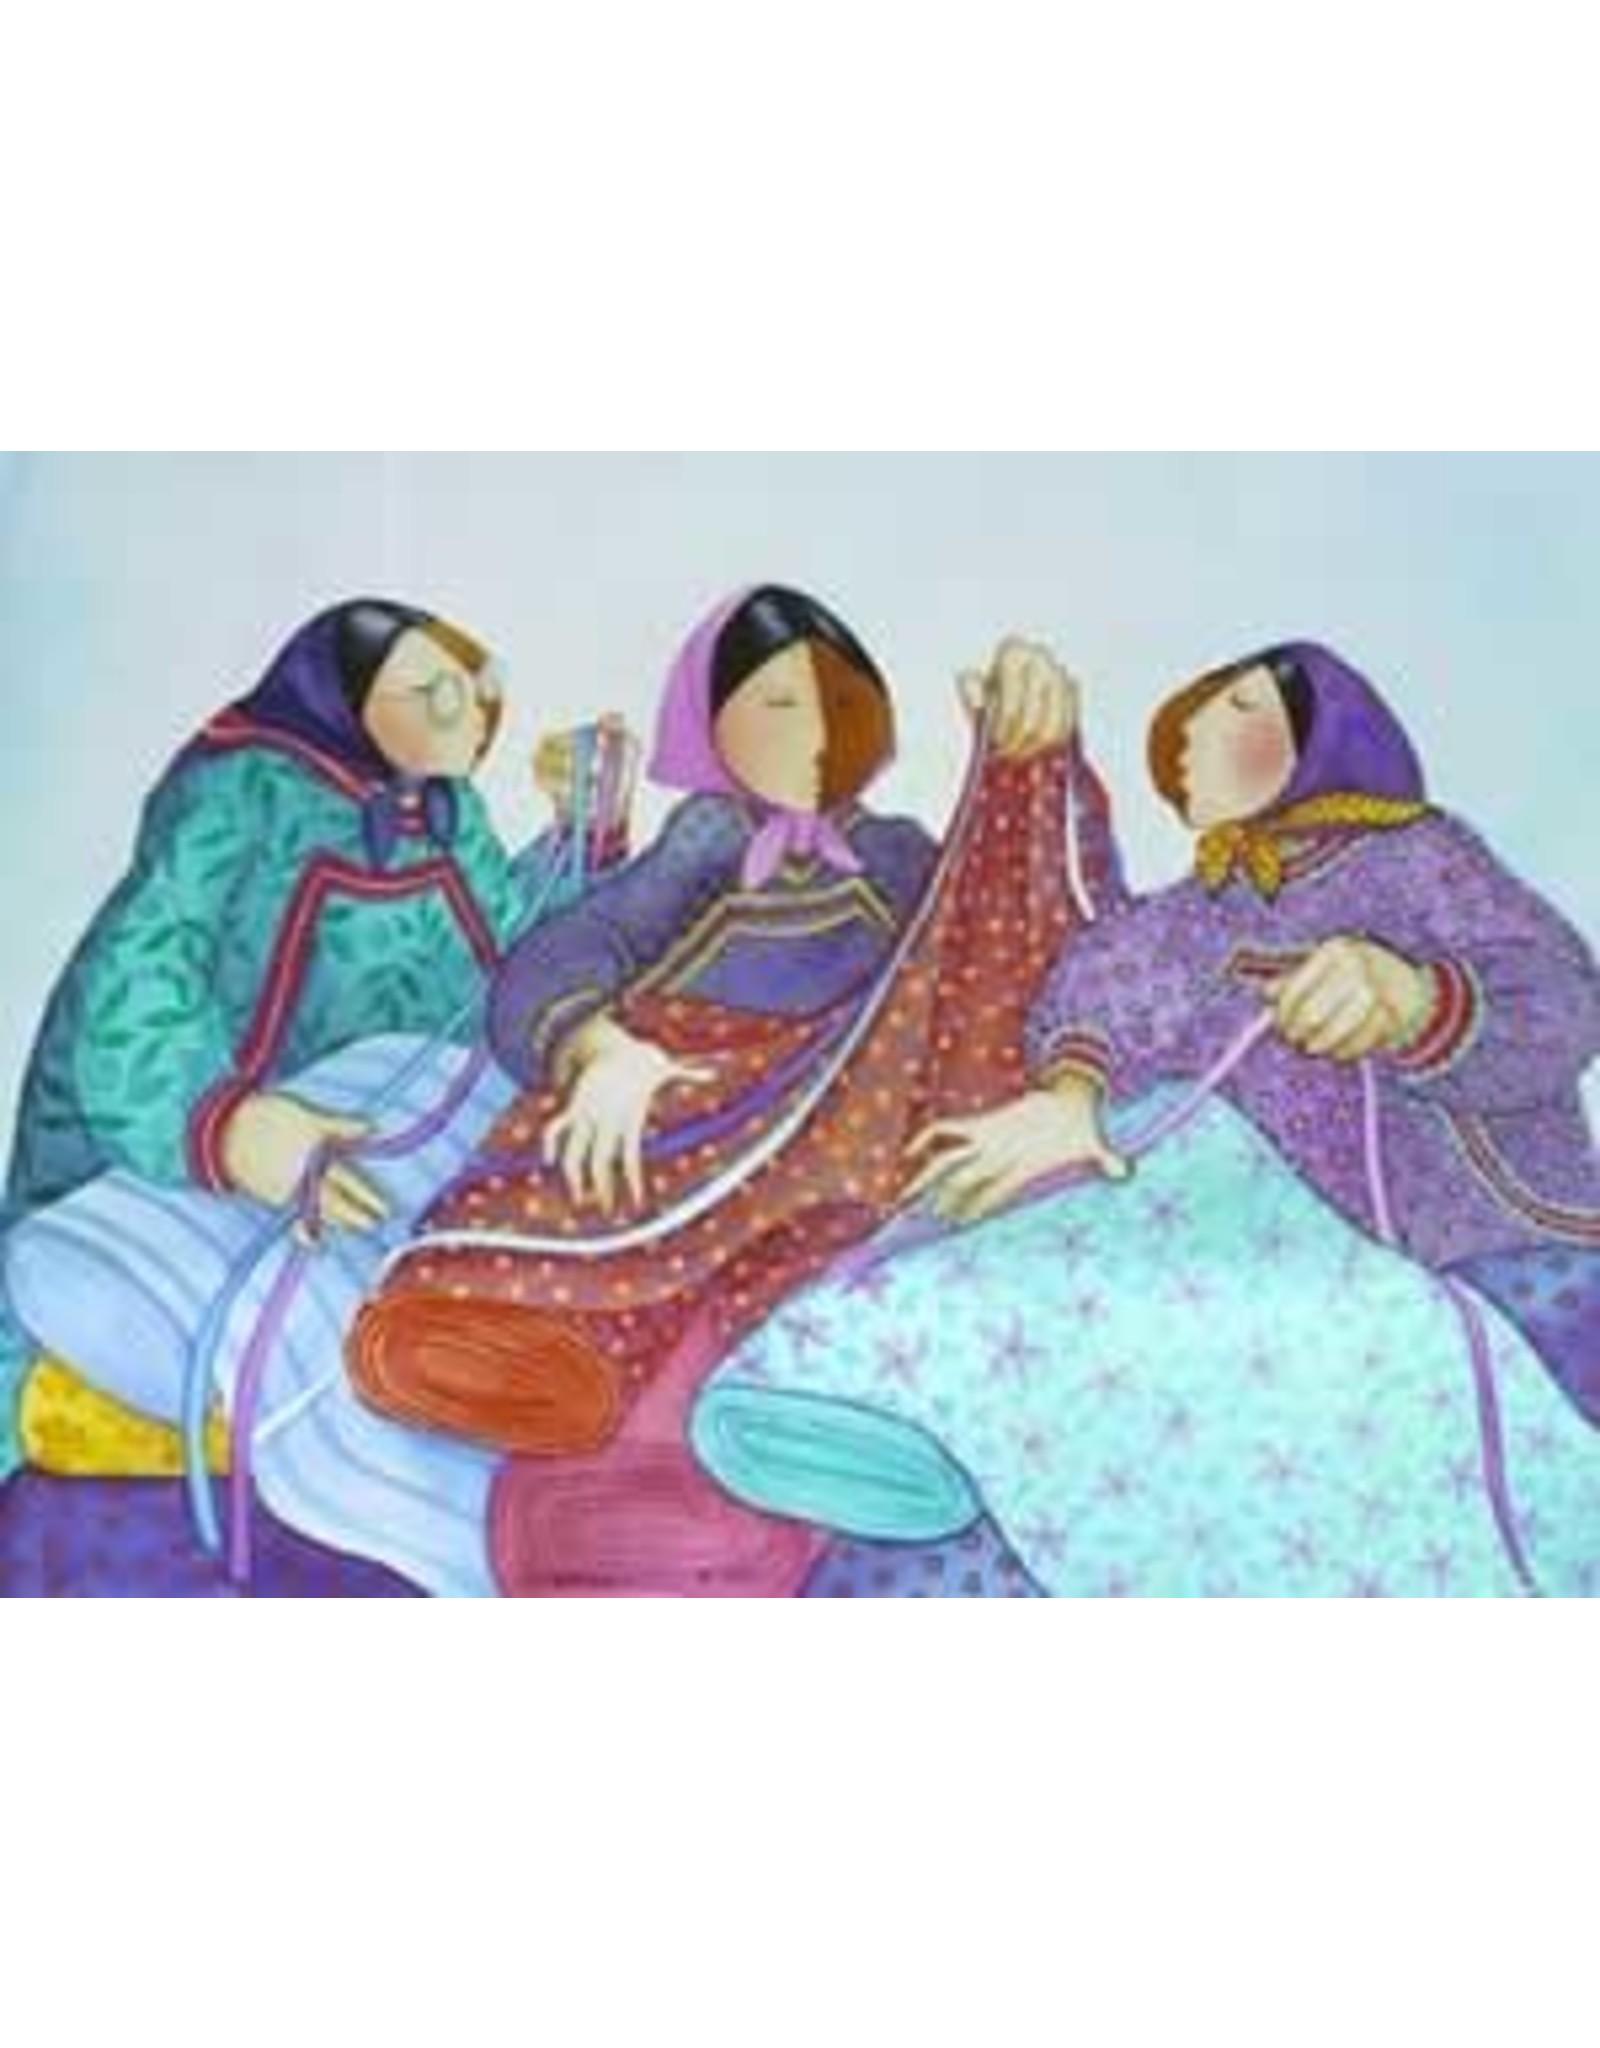 Barbara Lavallee Eskimos and Calicos (art card) | Barbara Lavallee